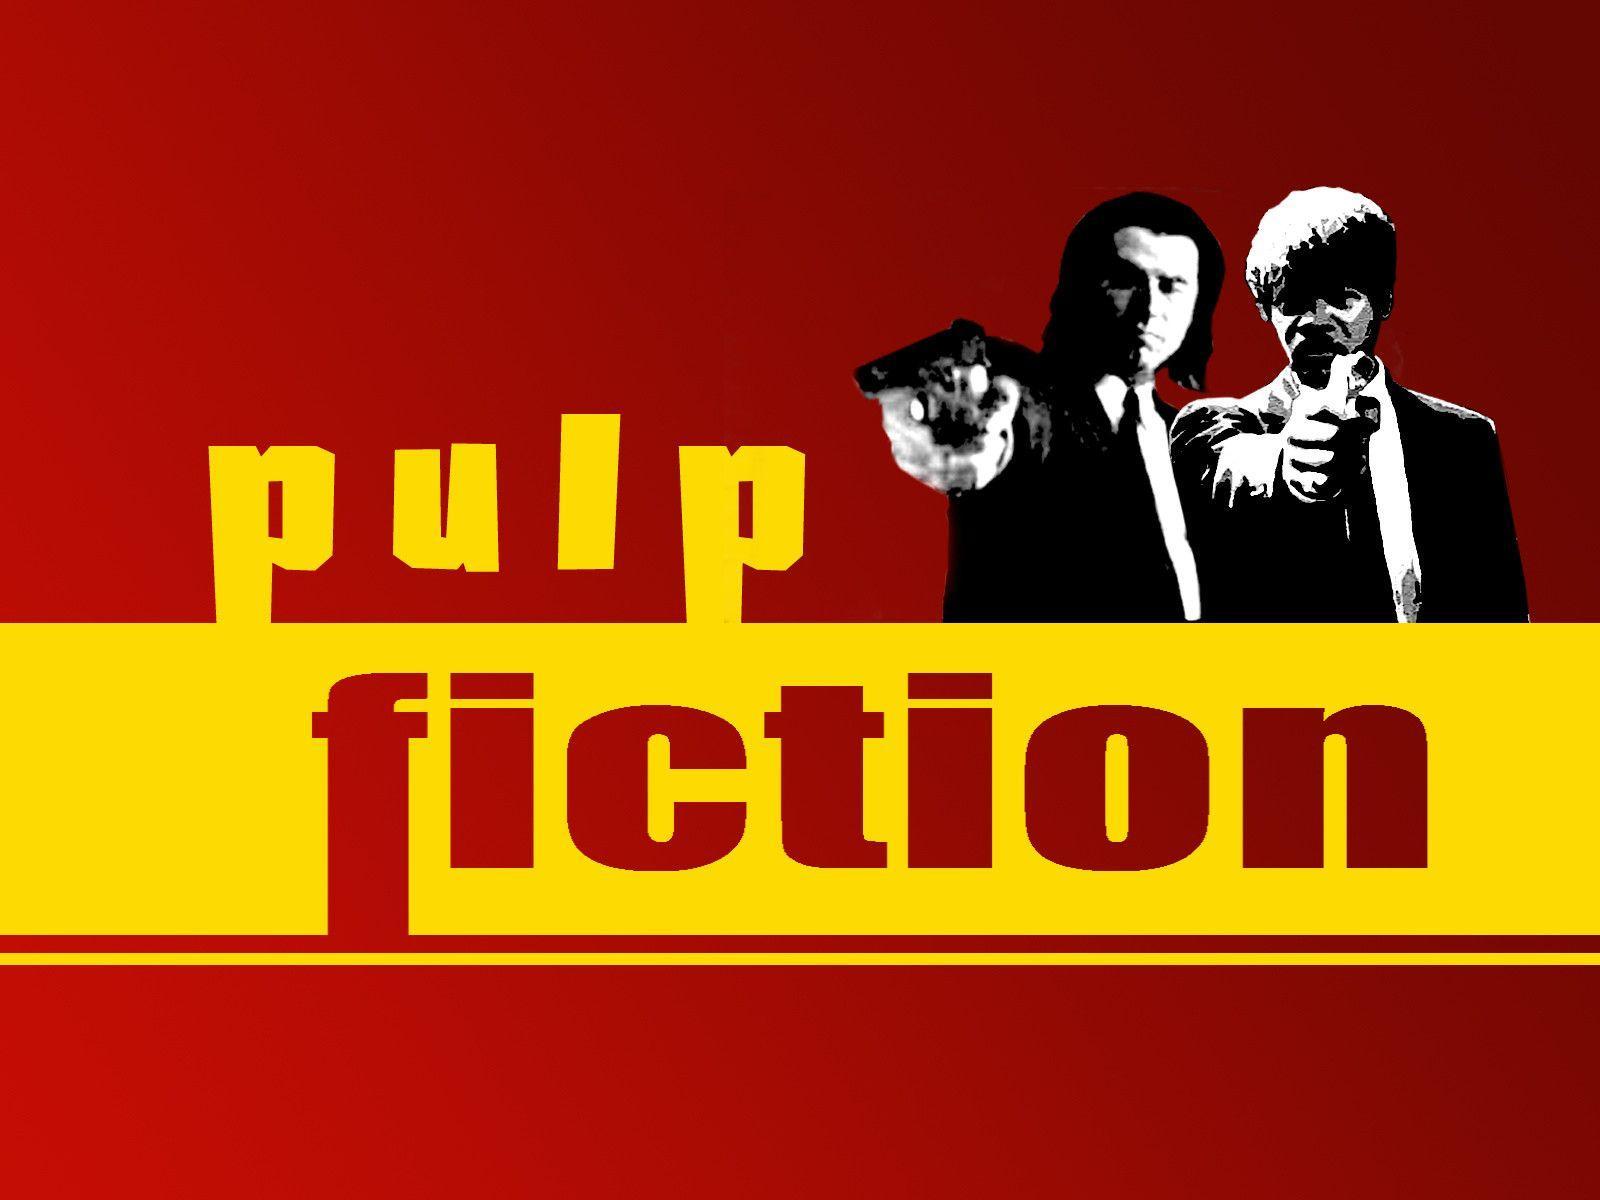 Pulp Fiction Wallpaper   Large HD Wallpaper Database